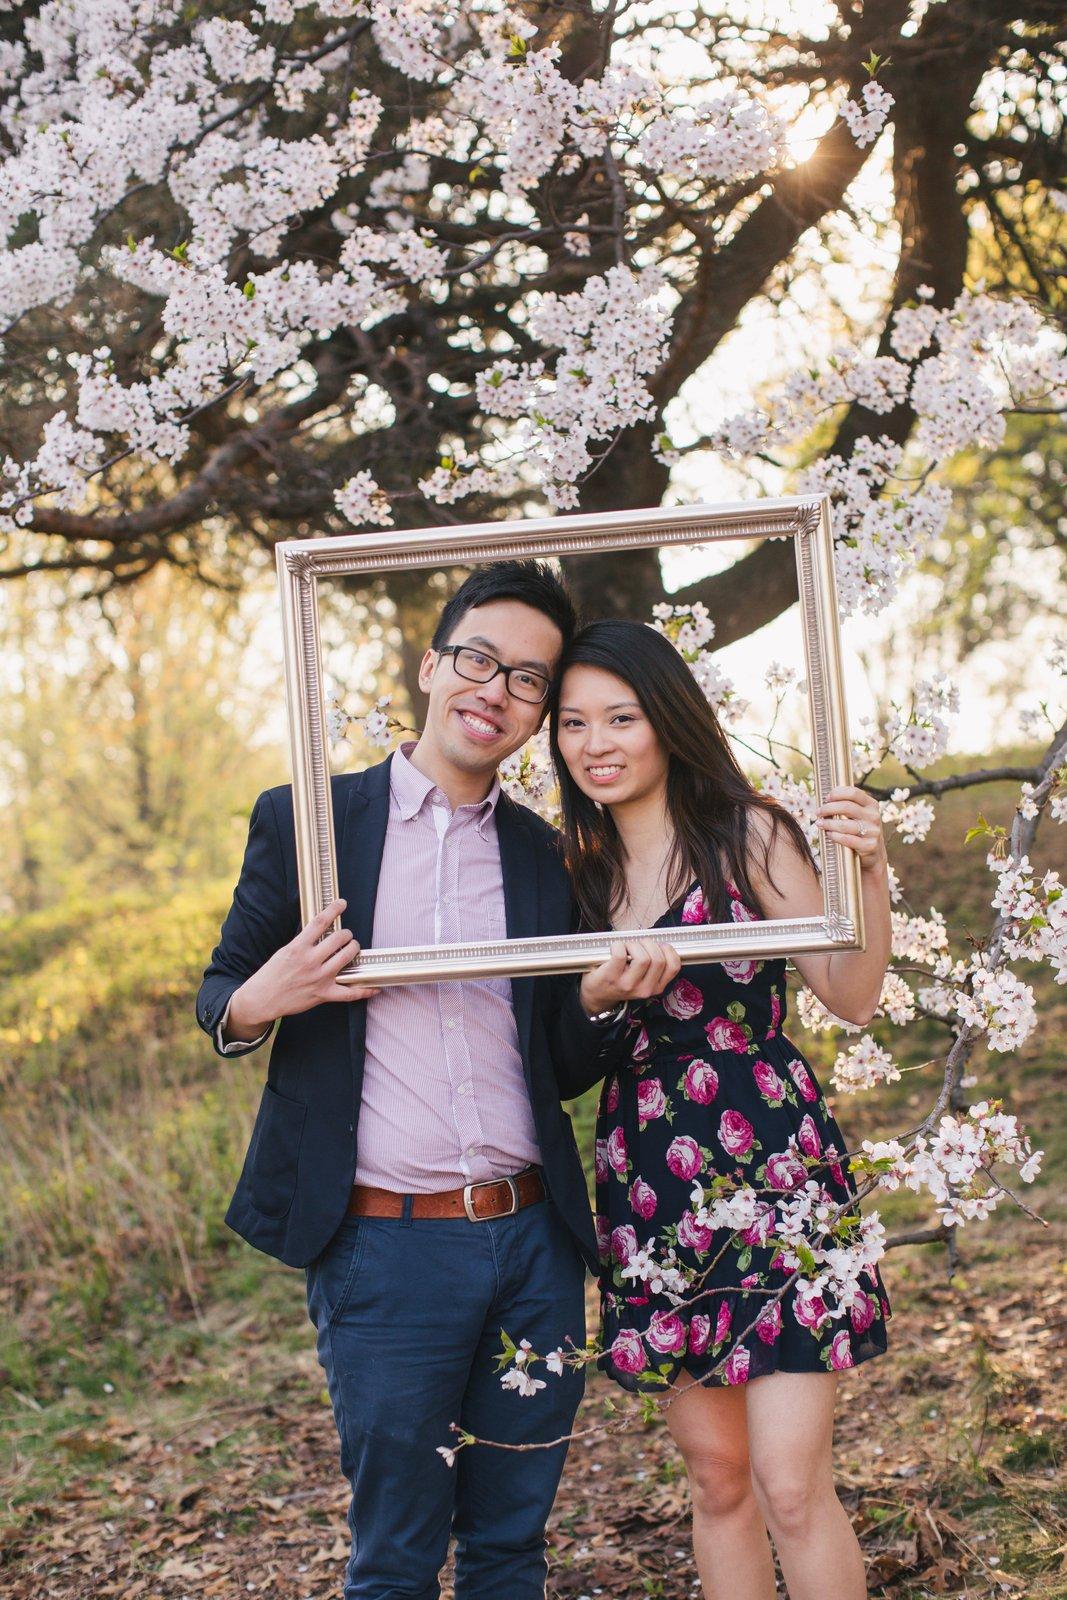 Jessica-Charles-Engagement-High-Park-Cherry-Blossom-016